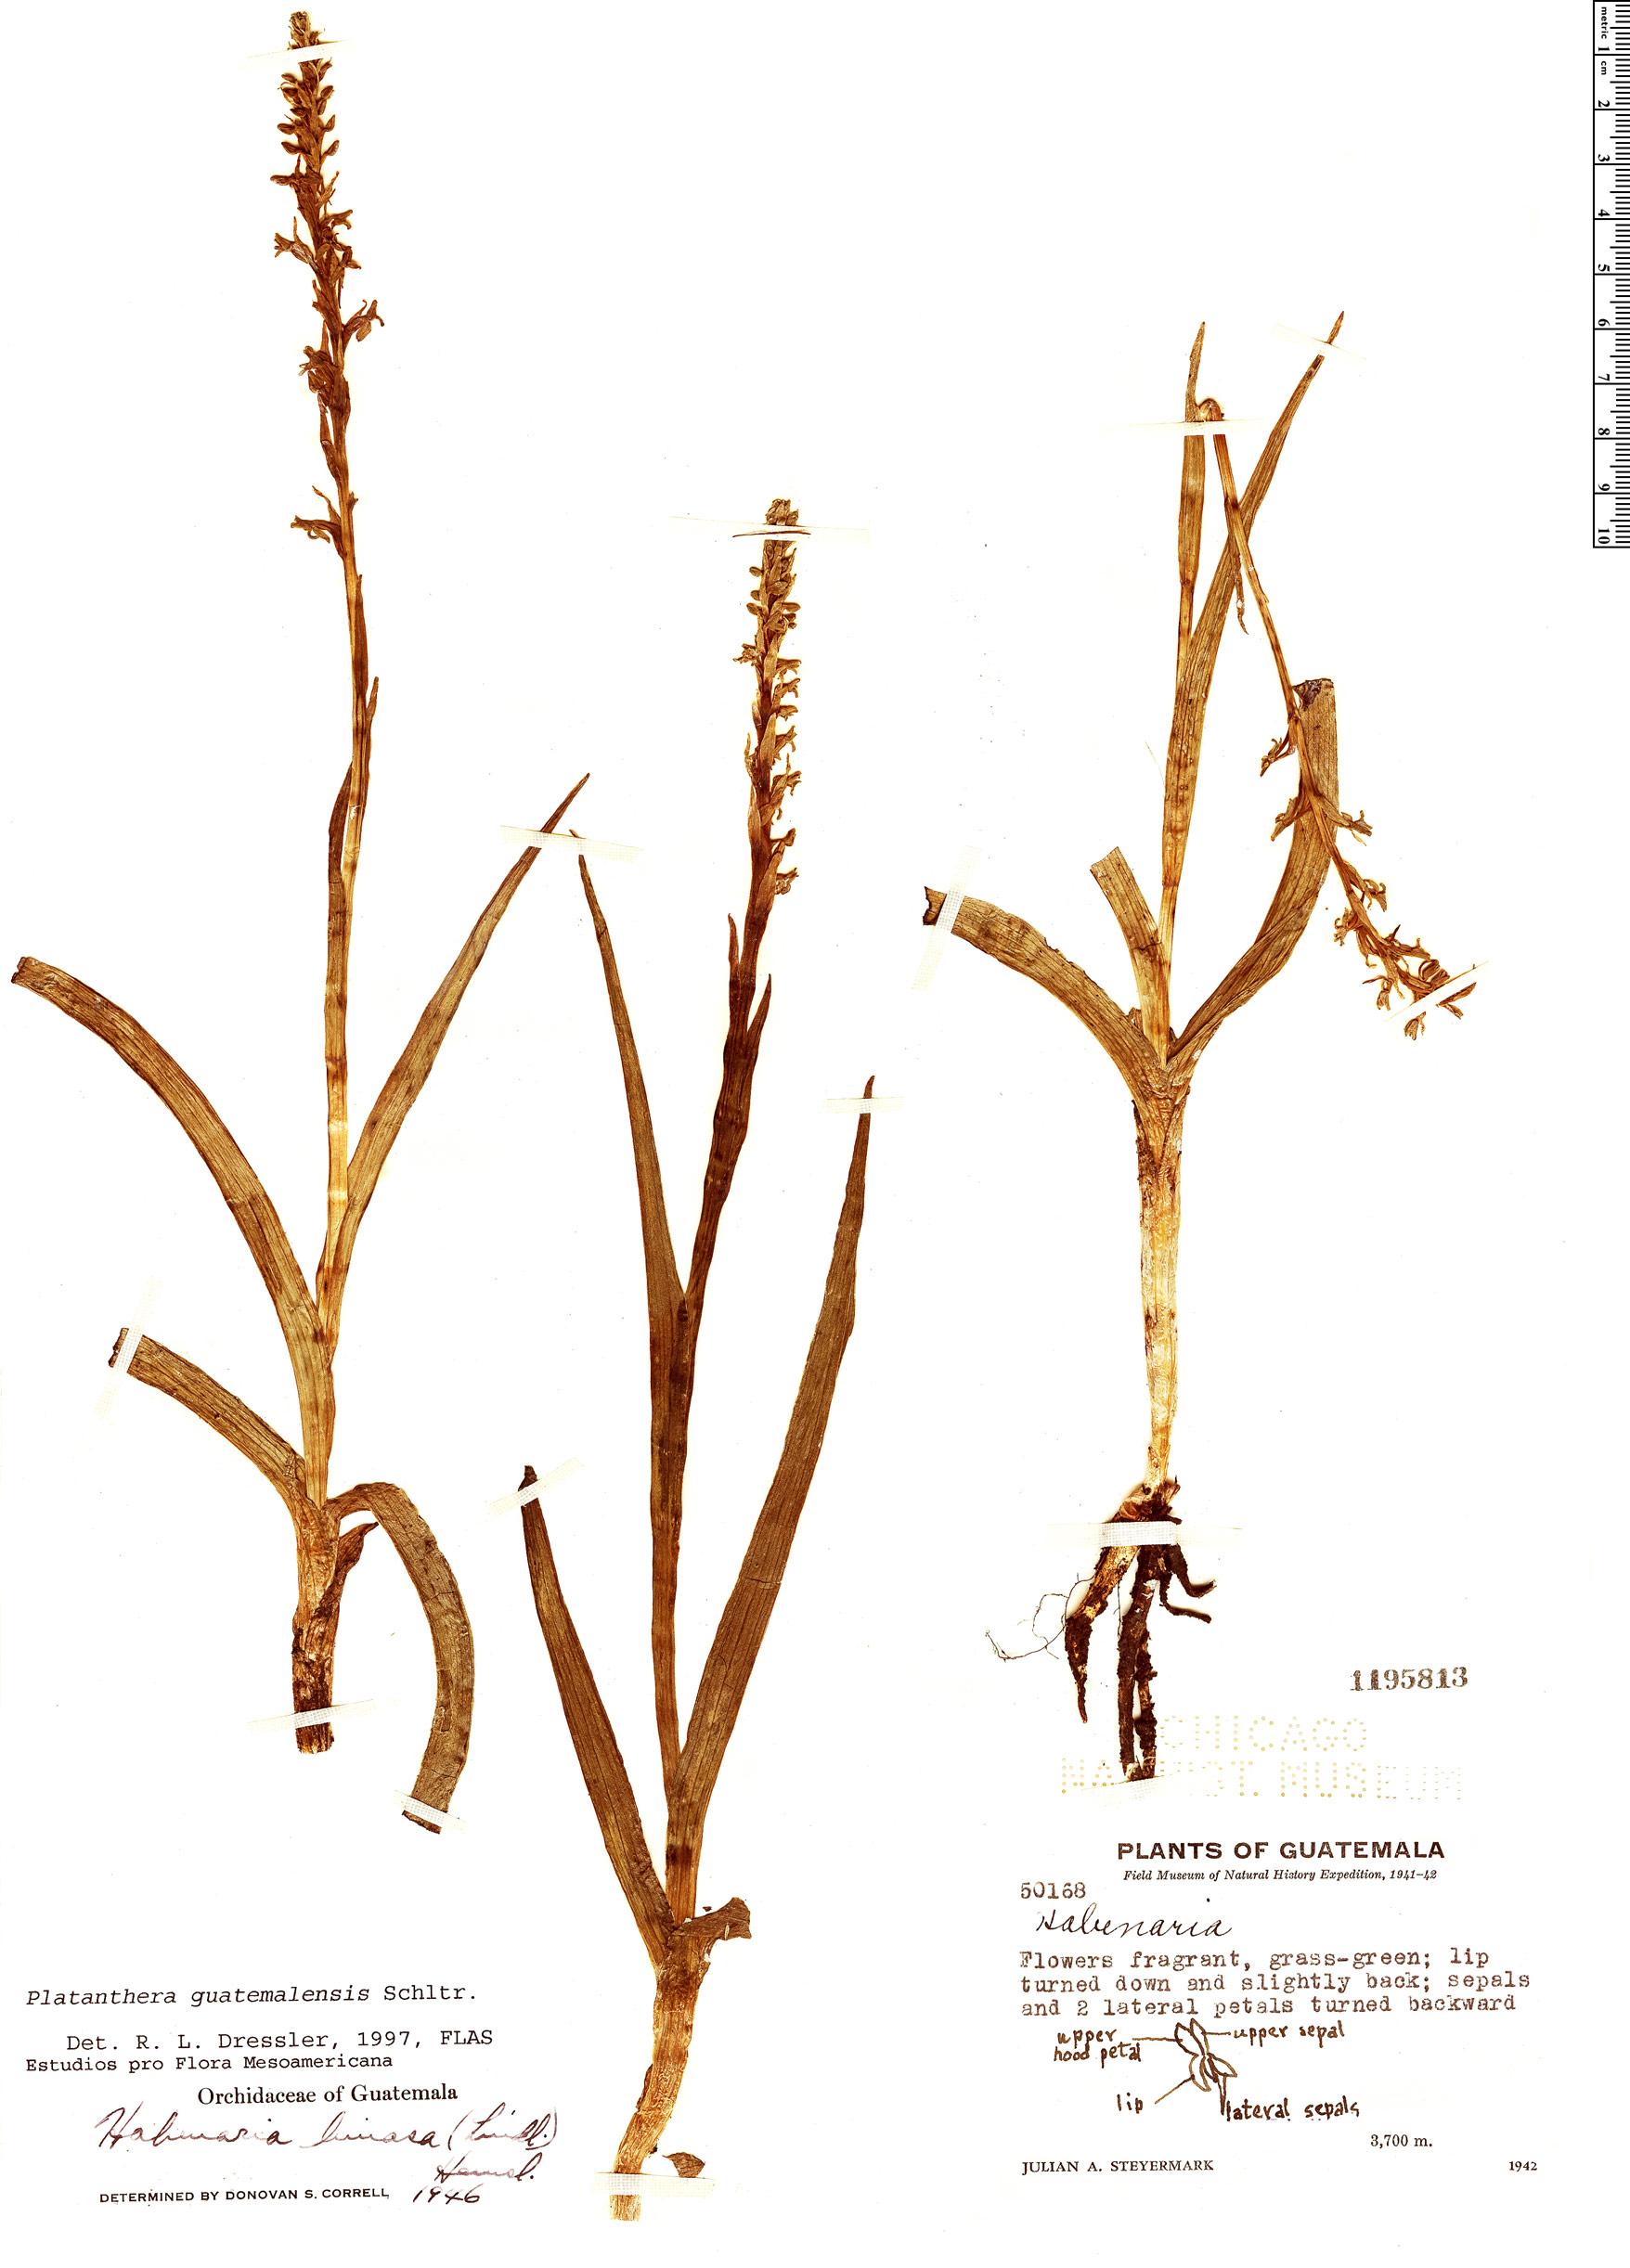 Specimen: Platanthera guatemalensis